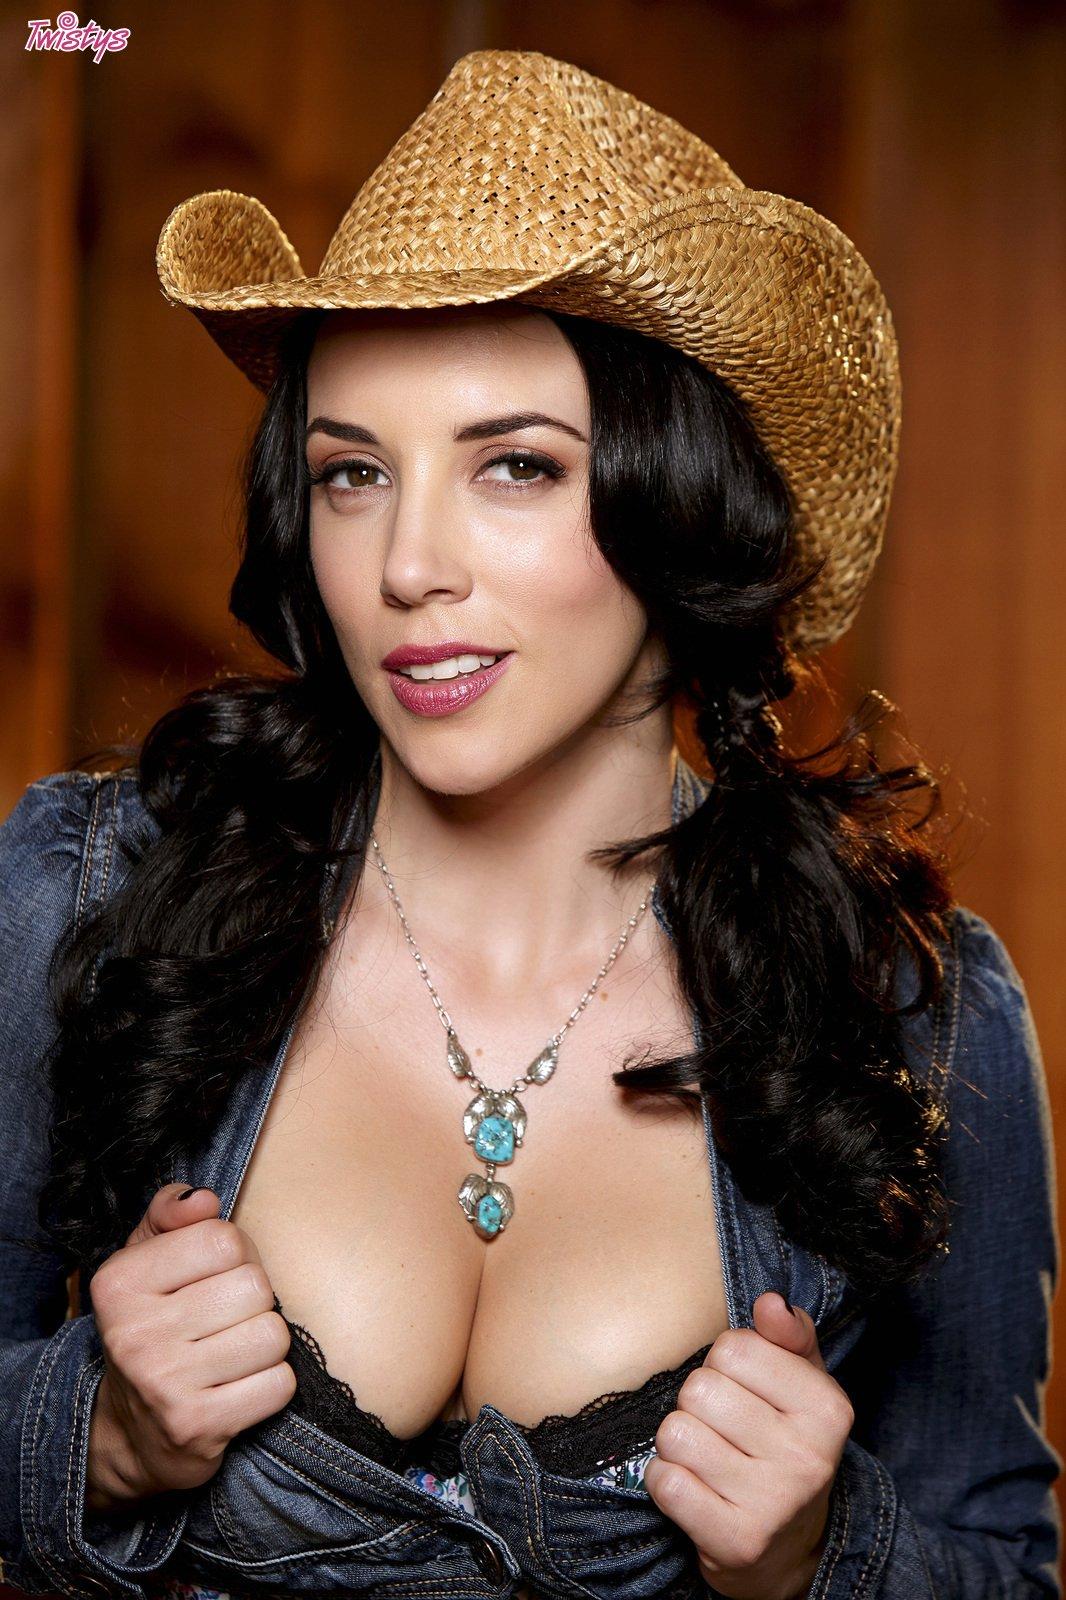 jelena jensen country girl